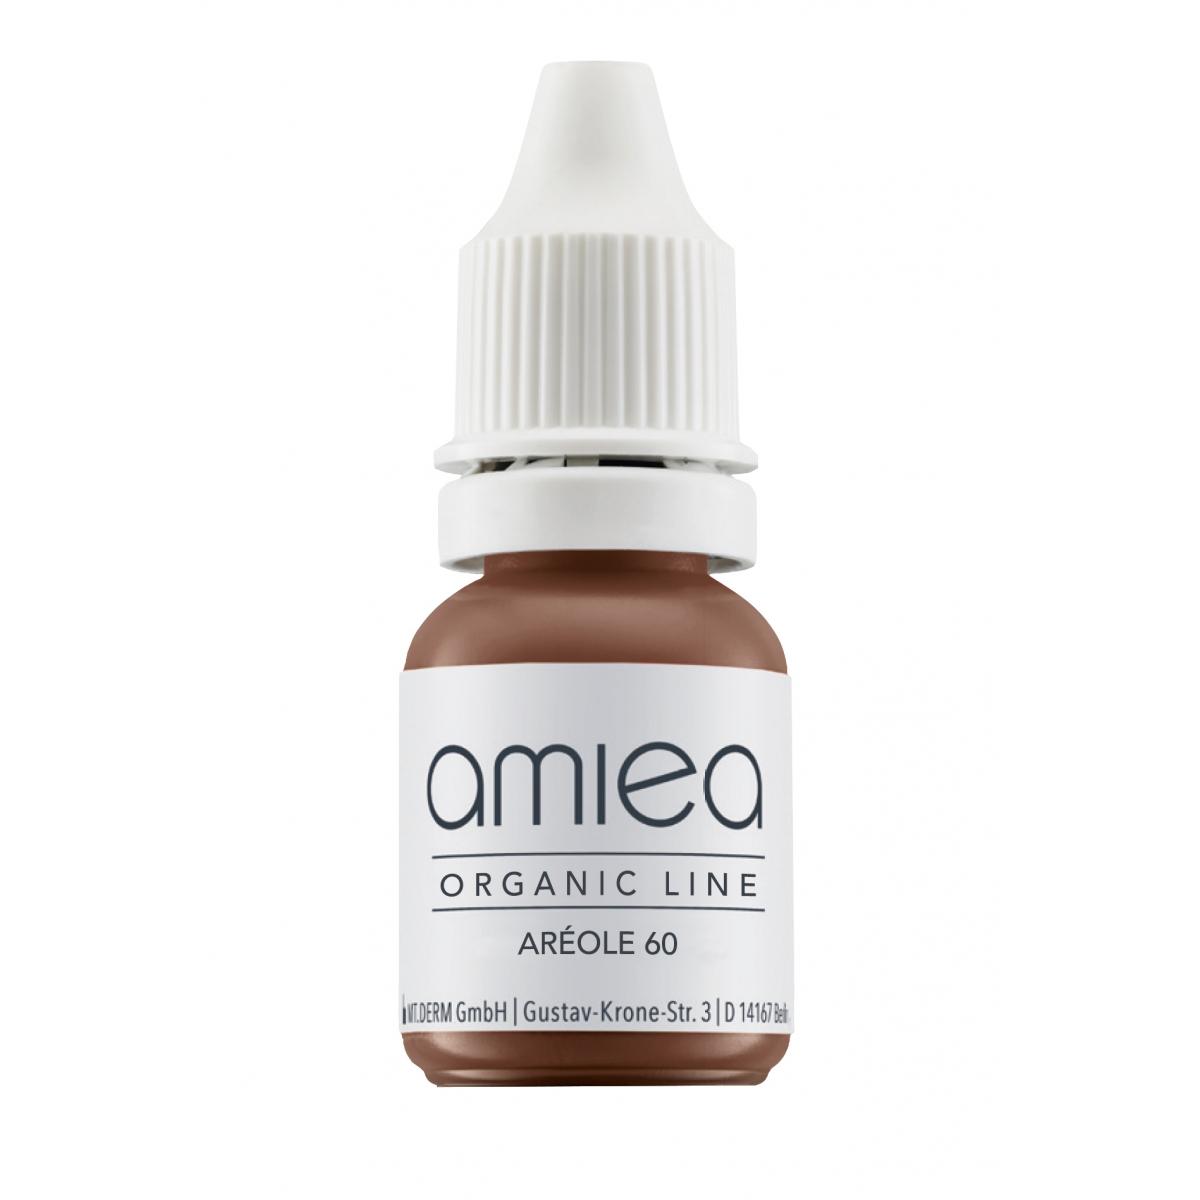 ORGANIC LINE (5ml)  - PIGMENT AREOLES 60 ORGANICLINE AMIEA (5 ml)